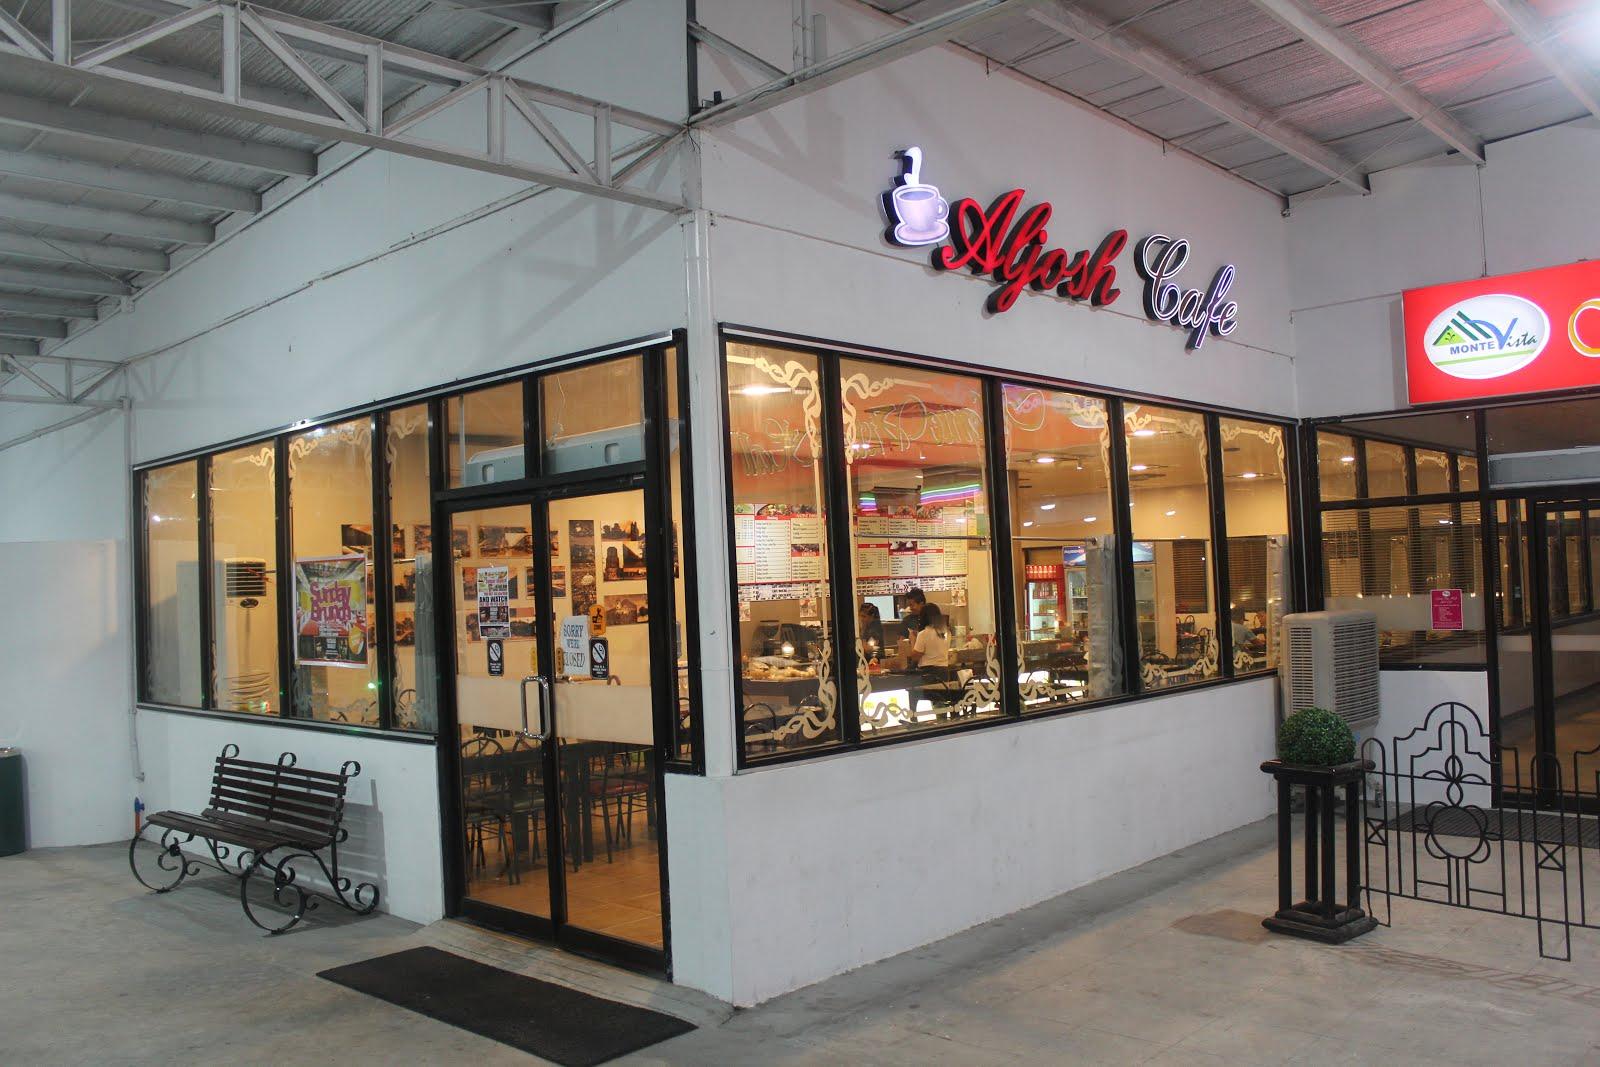 Stay Stray Play And Feast Aljosh Caf S Angus Burger Steak Montevista Walk Park Naga City